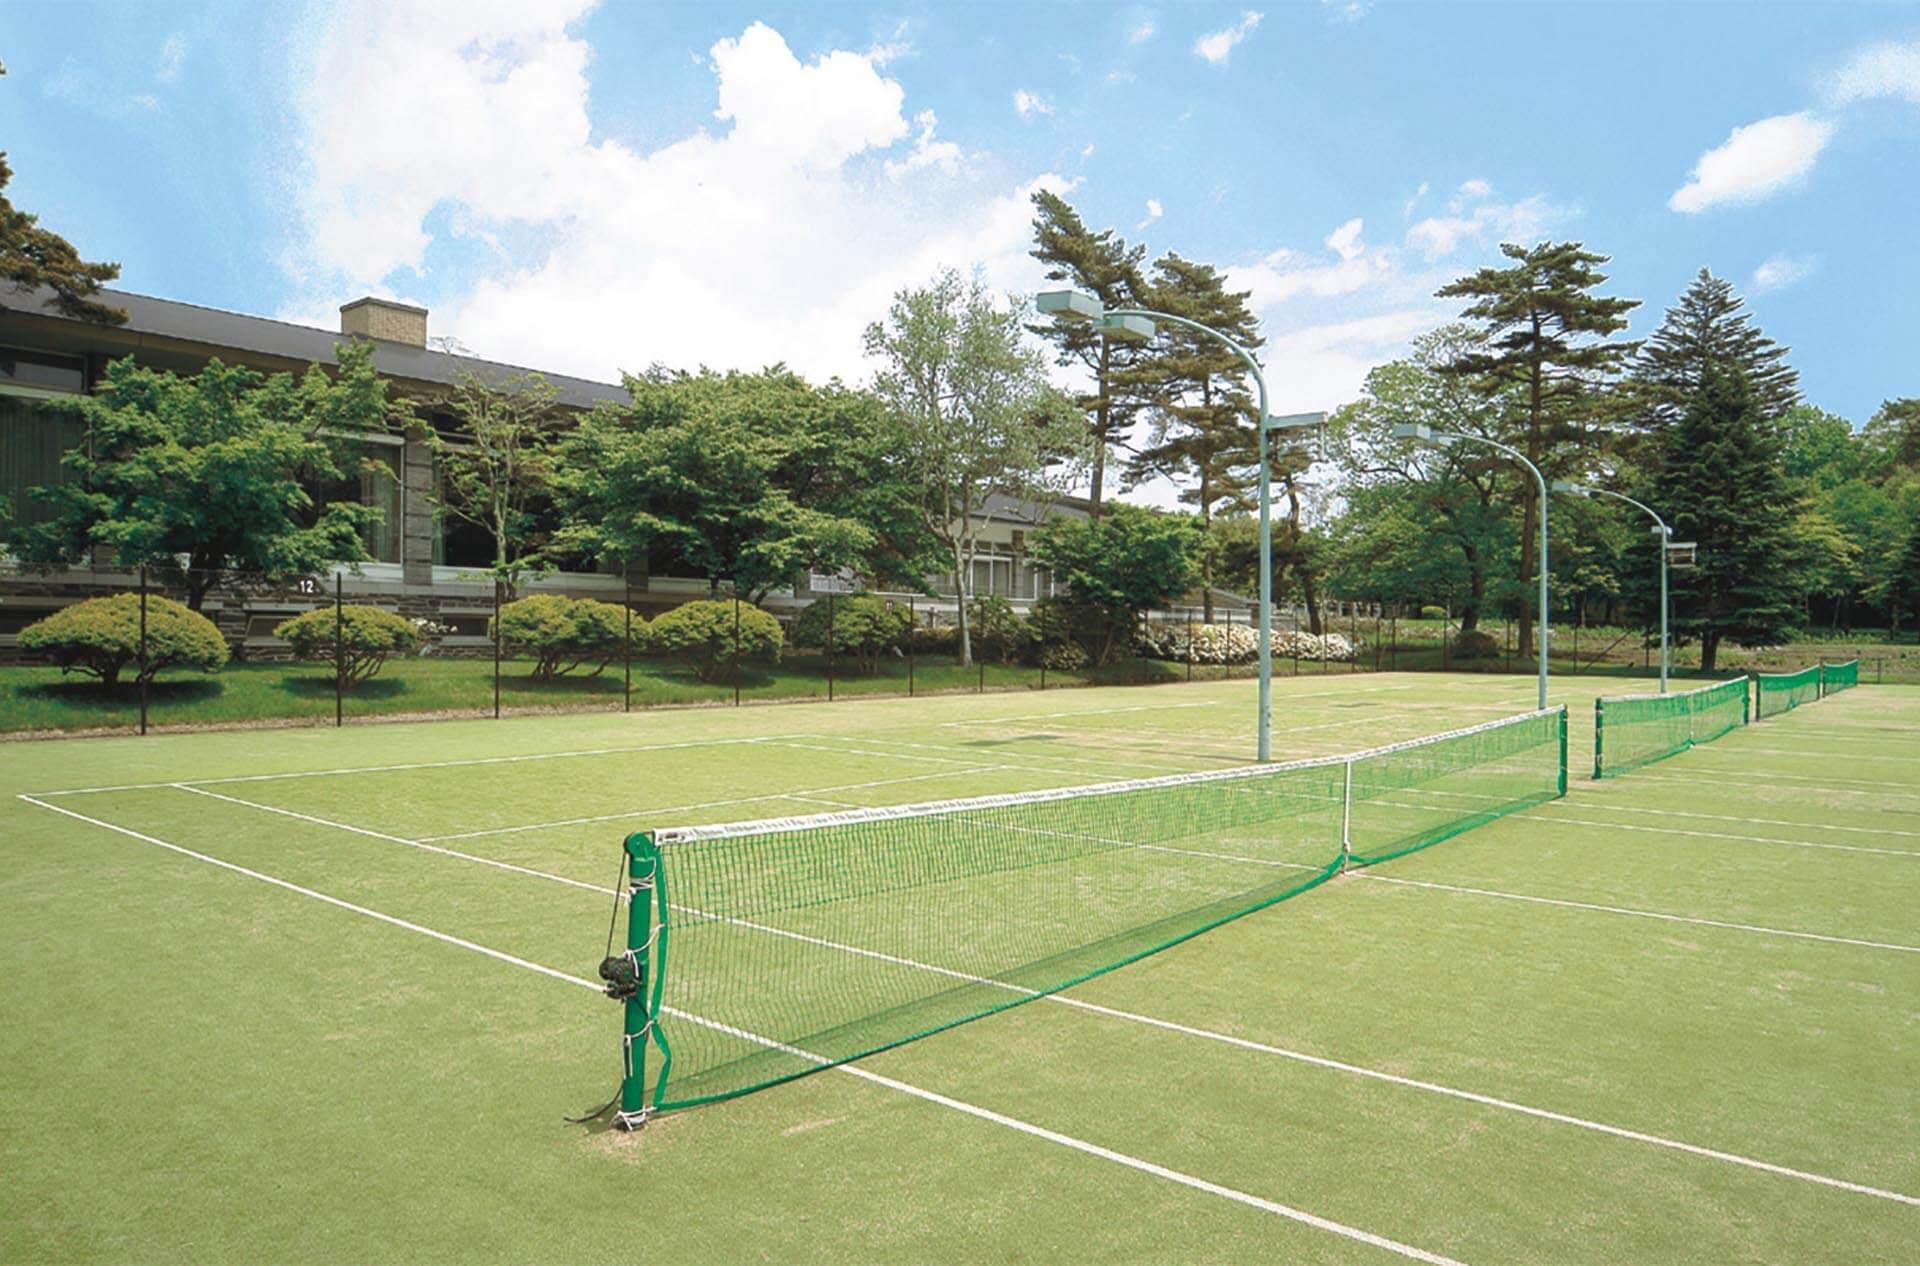 An exclusive Tennis Court